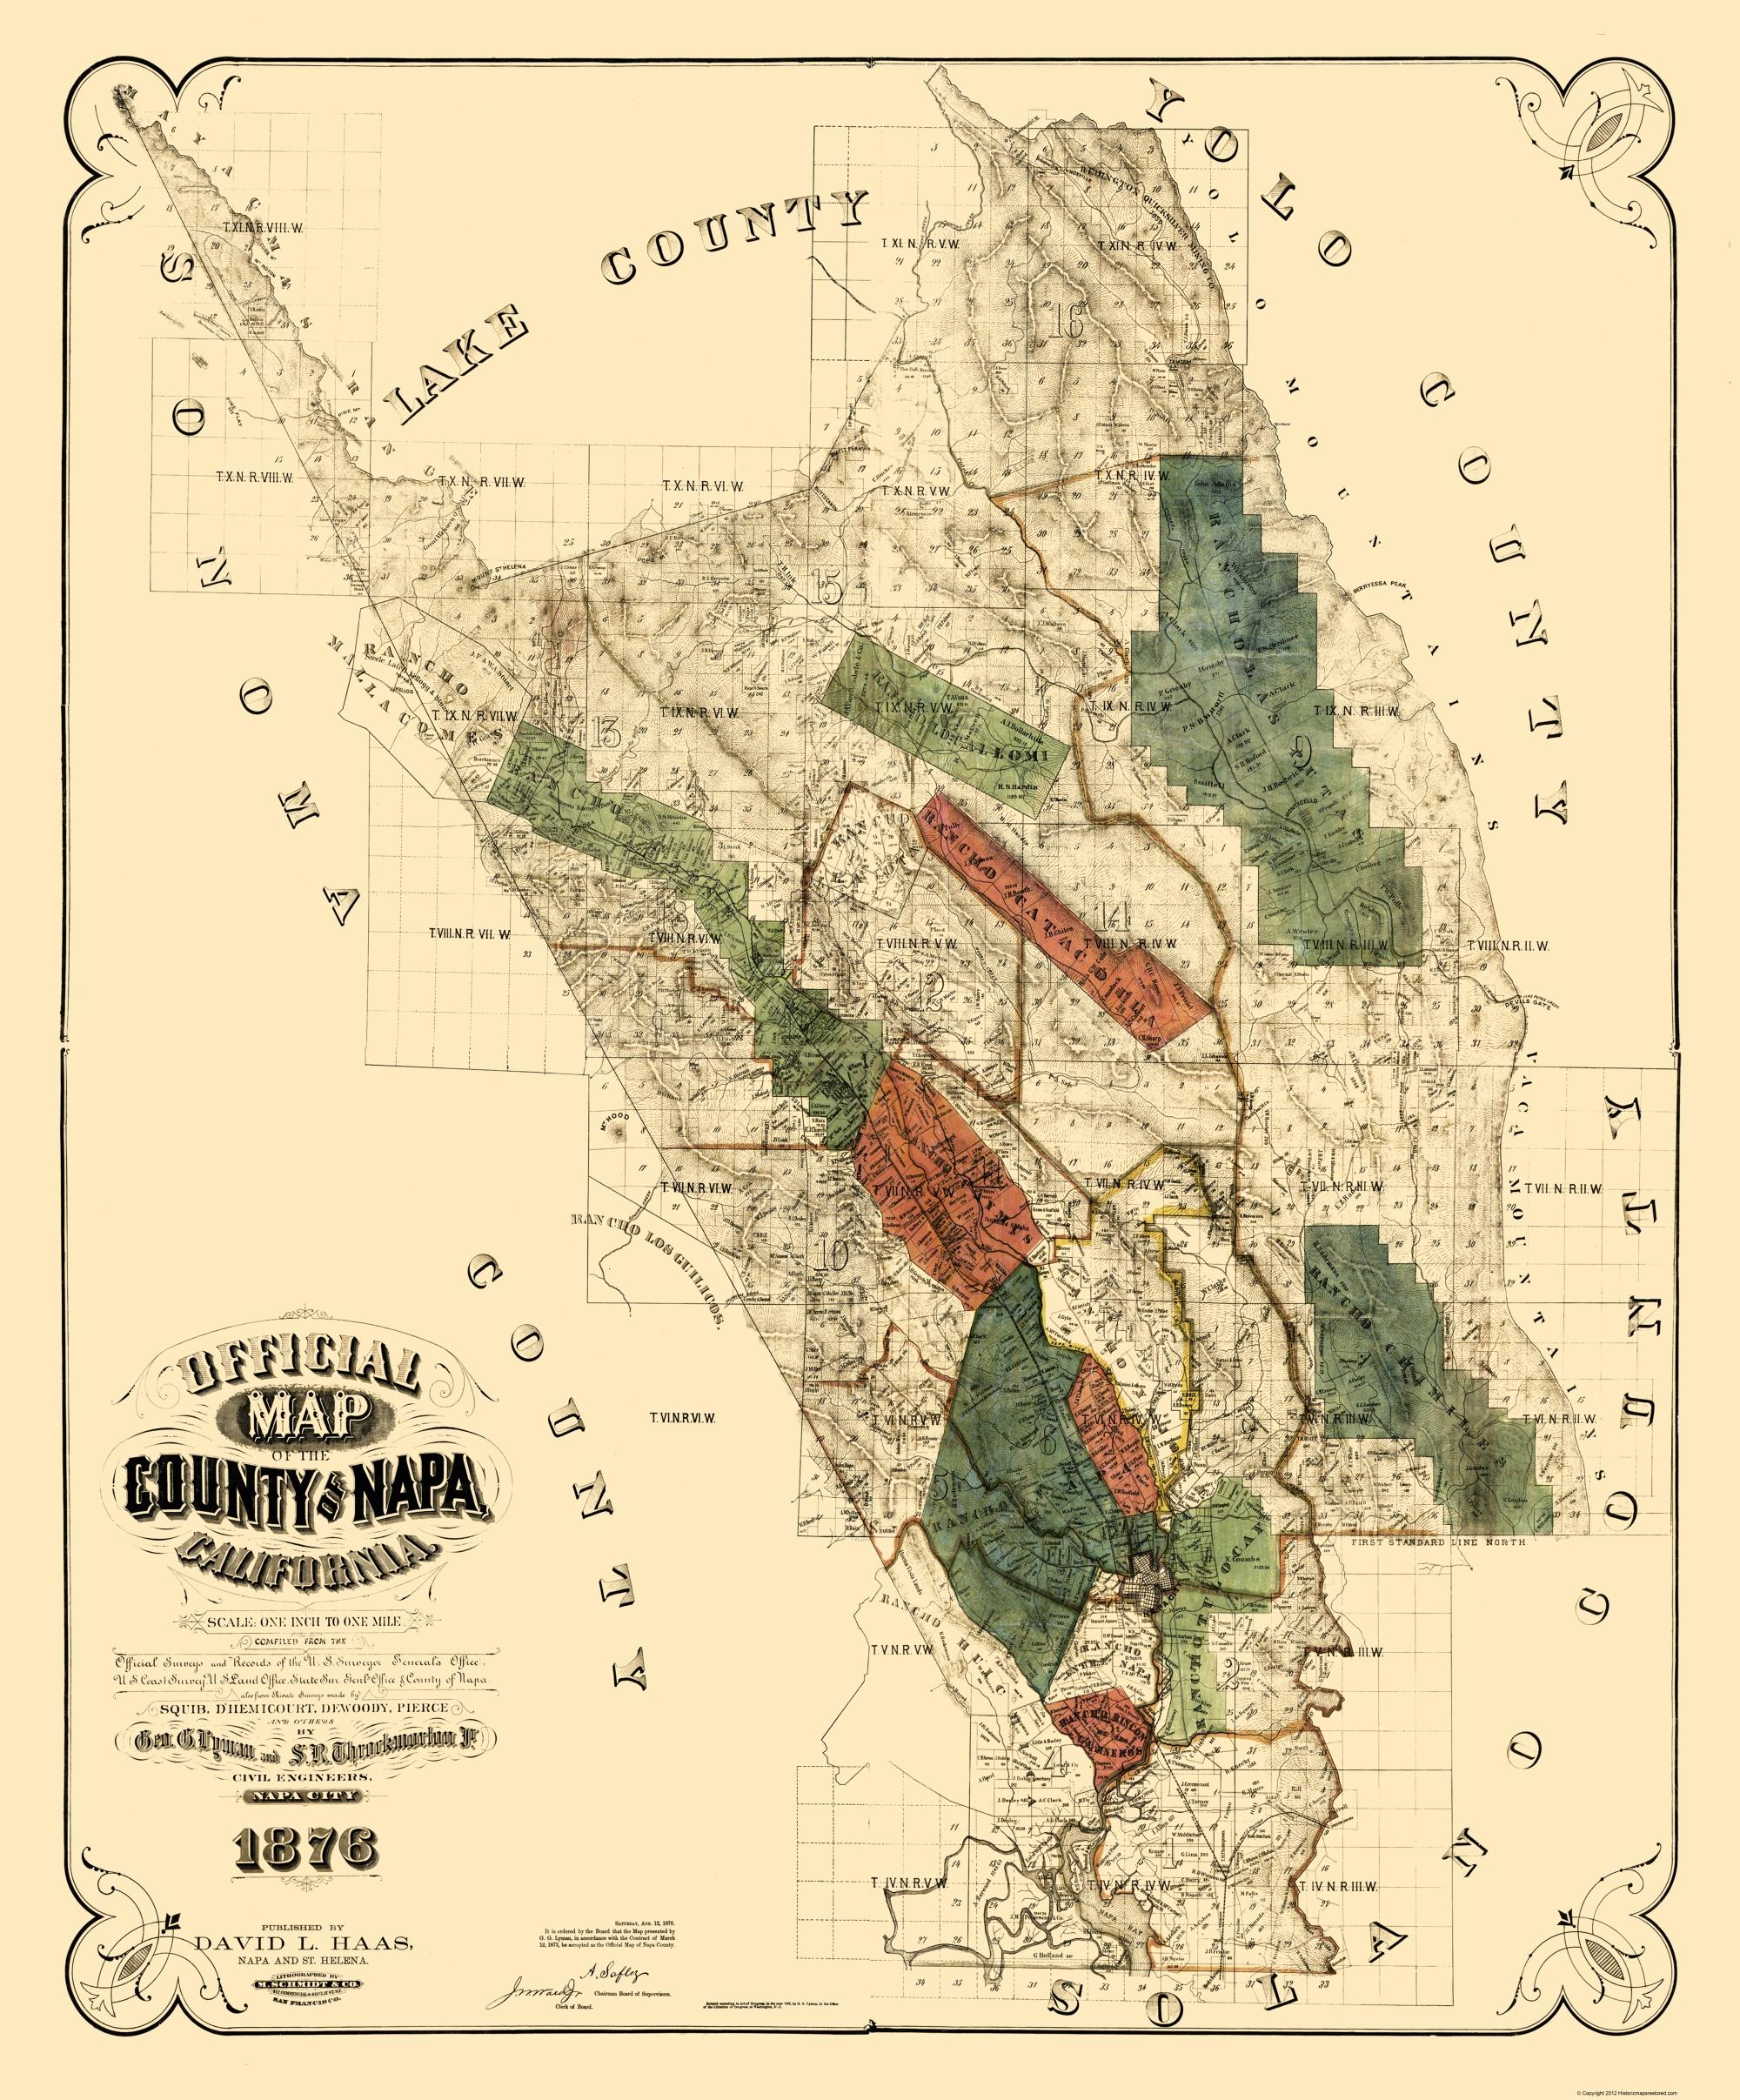 Old County Map Napa California Landowner Haas 1876